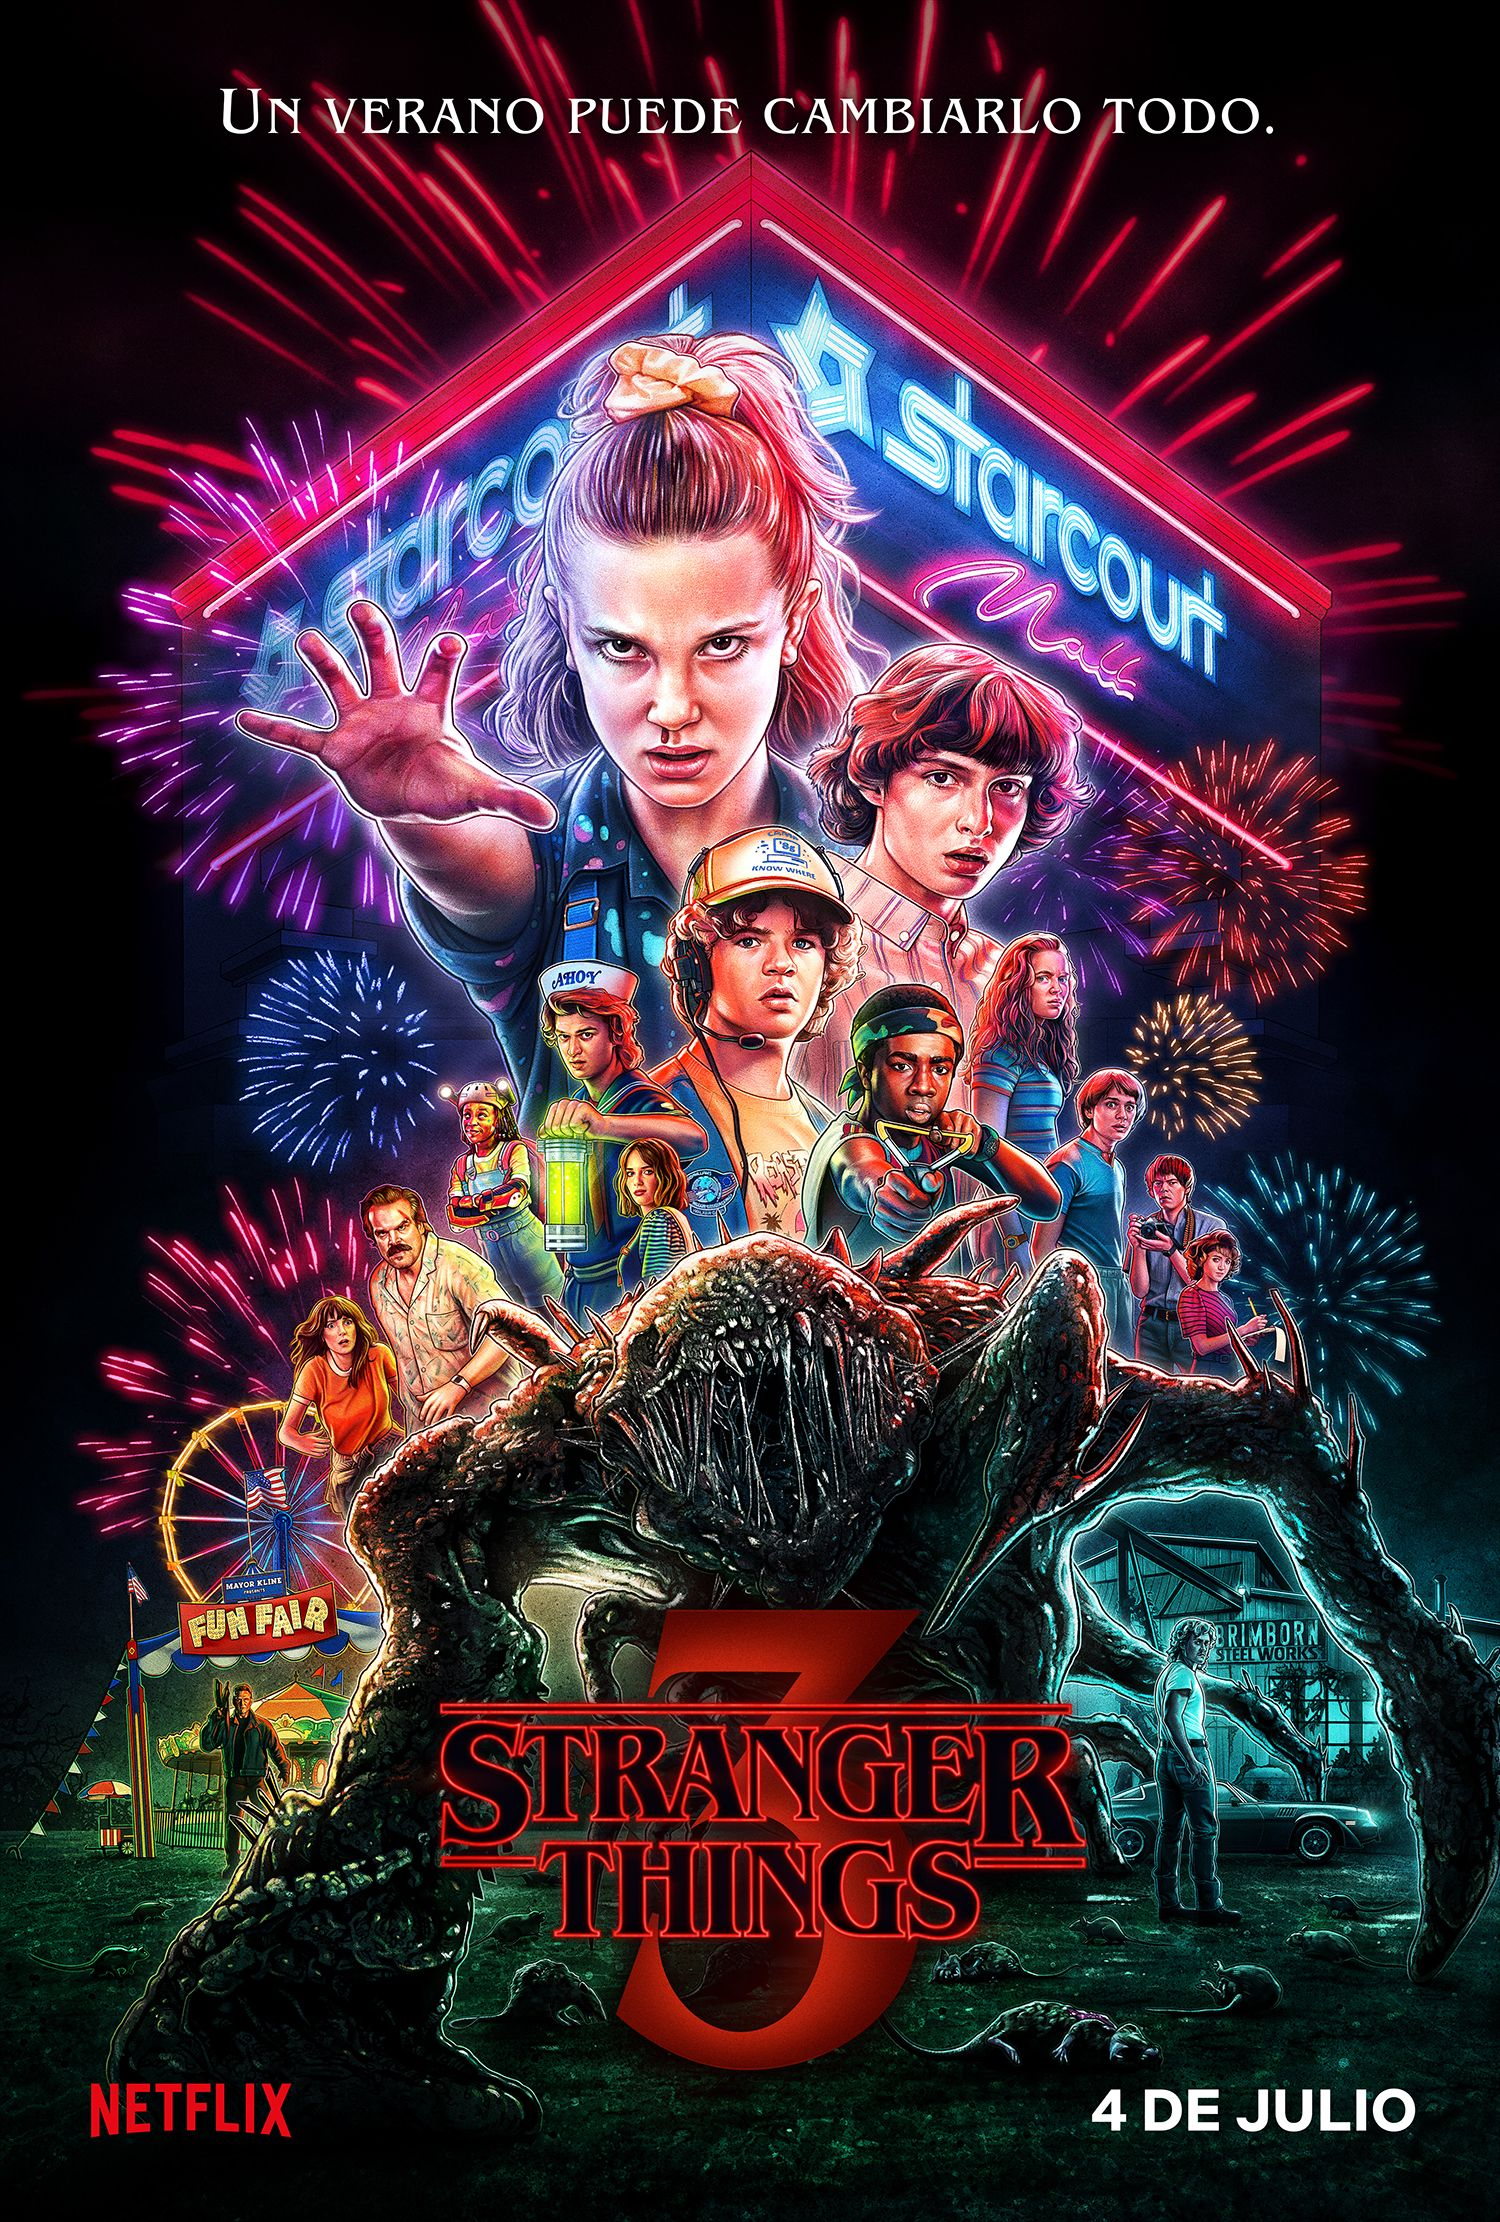 Resultado de imagen de stranger things 3 poster